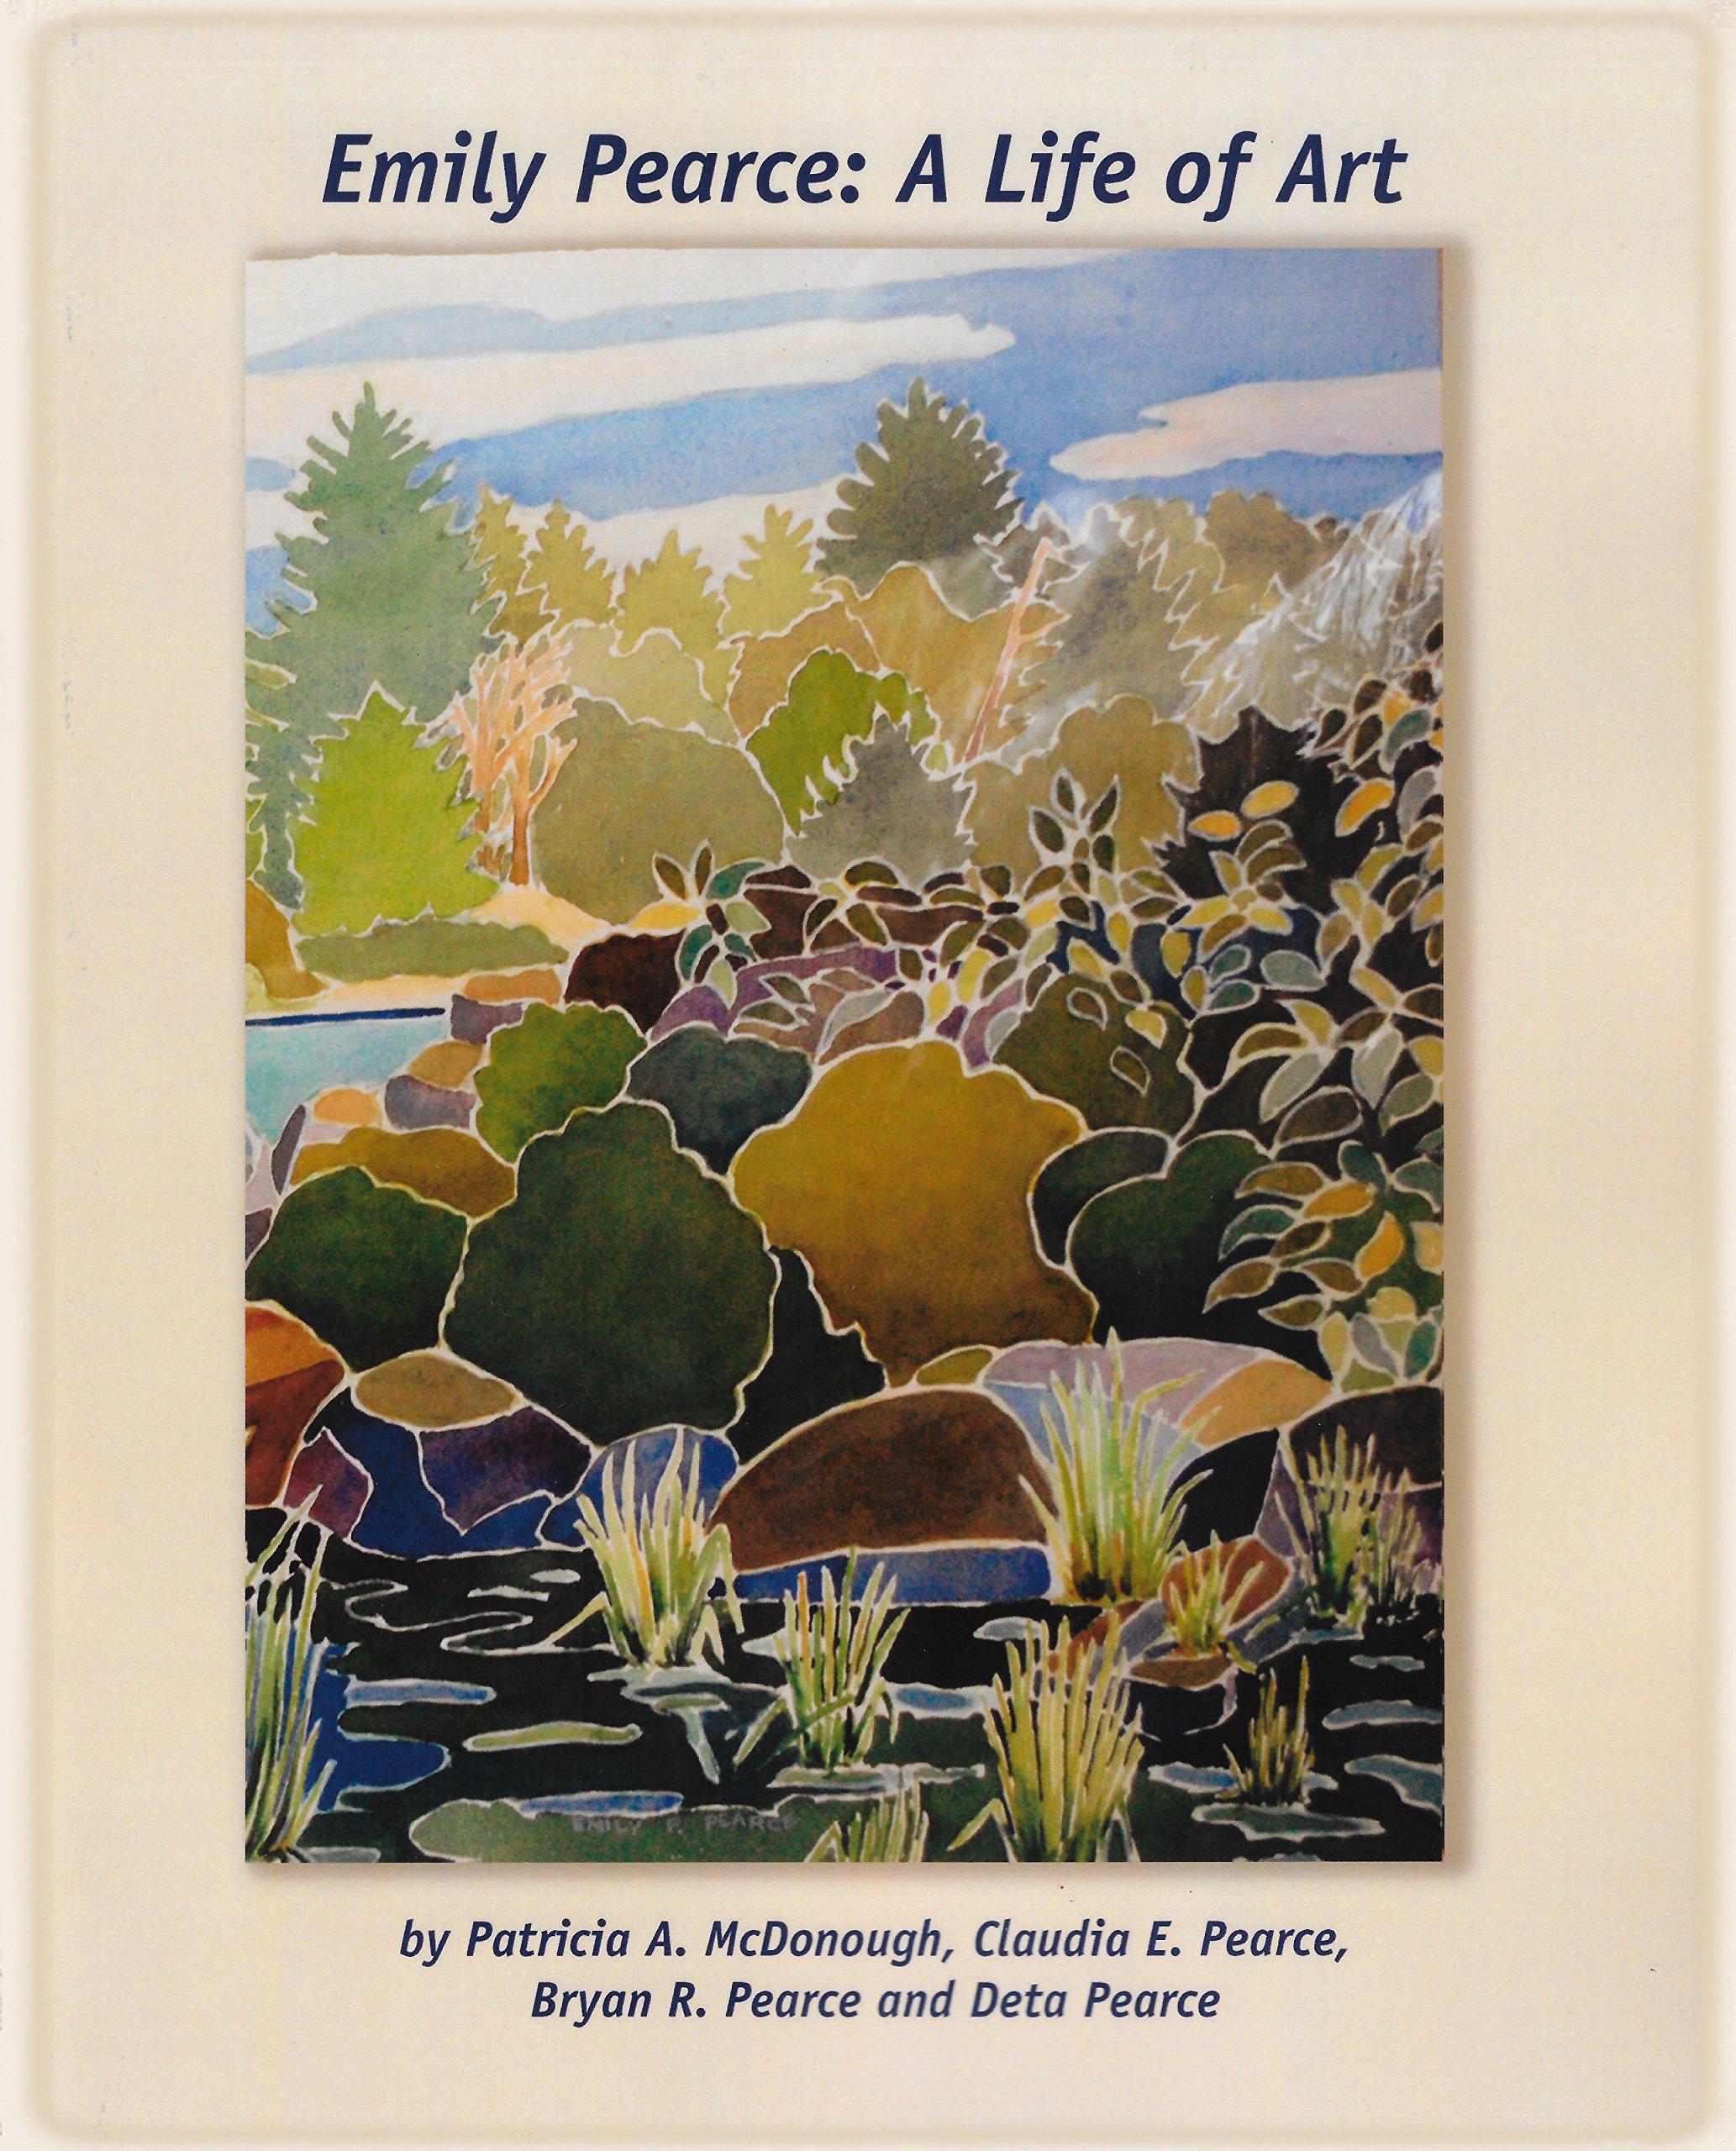 Emily Pearce: A Life of Art ebook